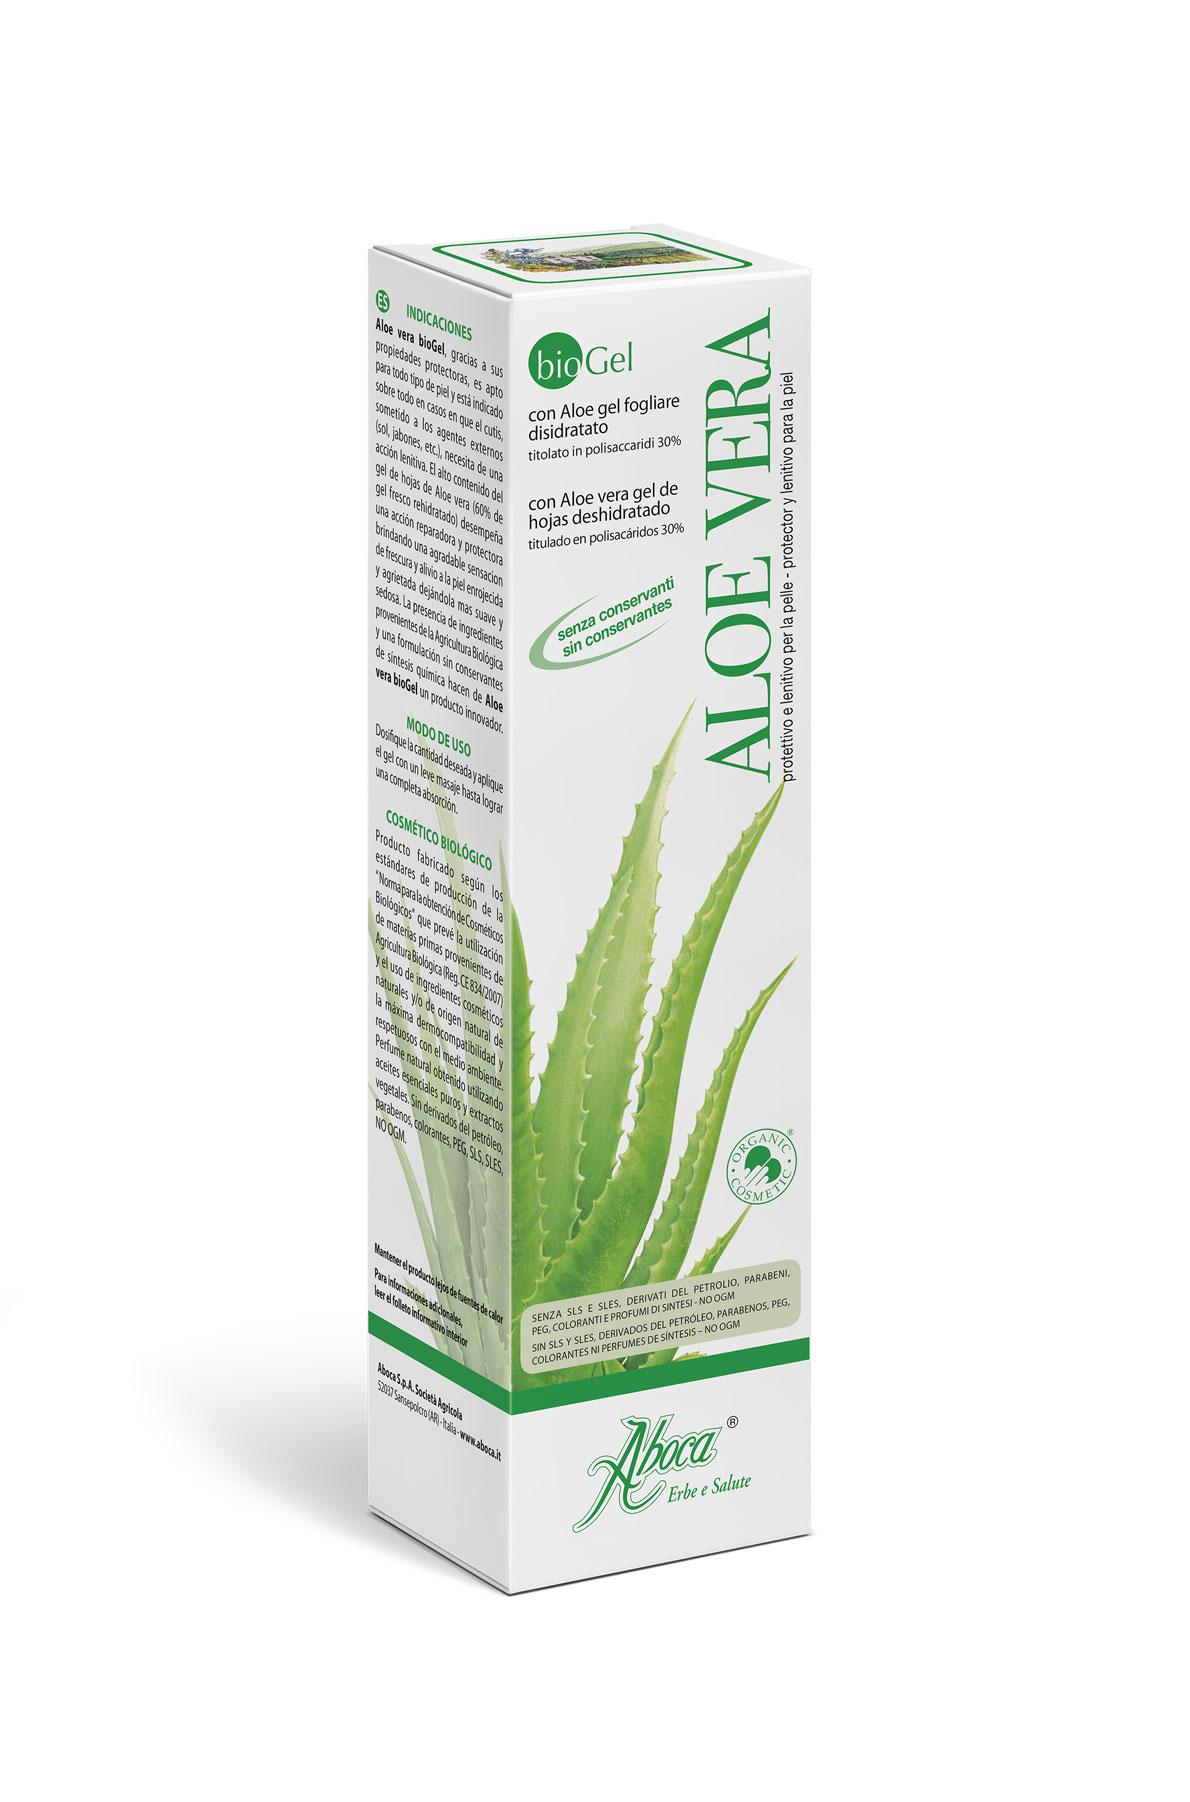 Image of Aboca Biogel Aloe 100ml 930931377